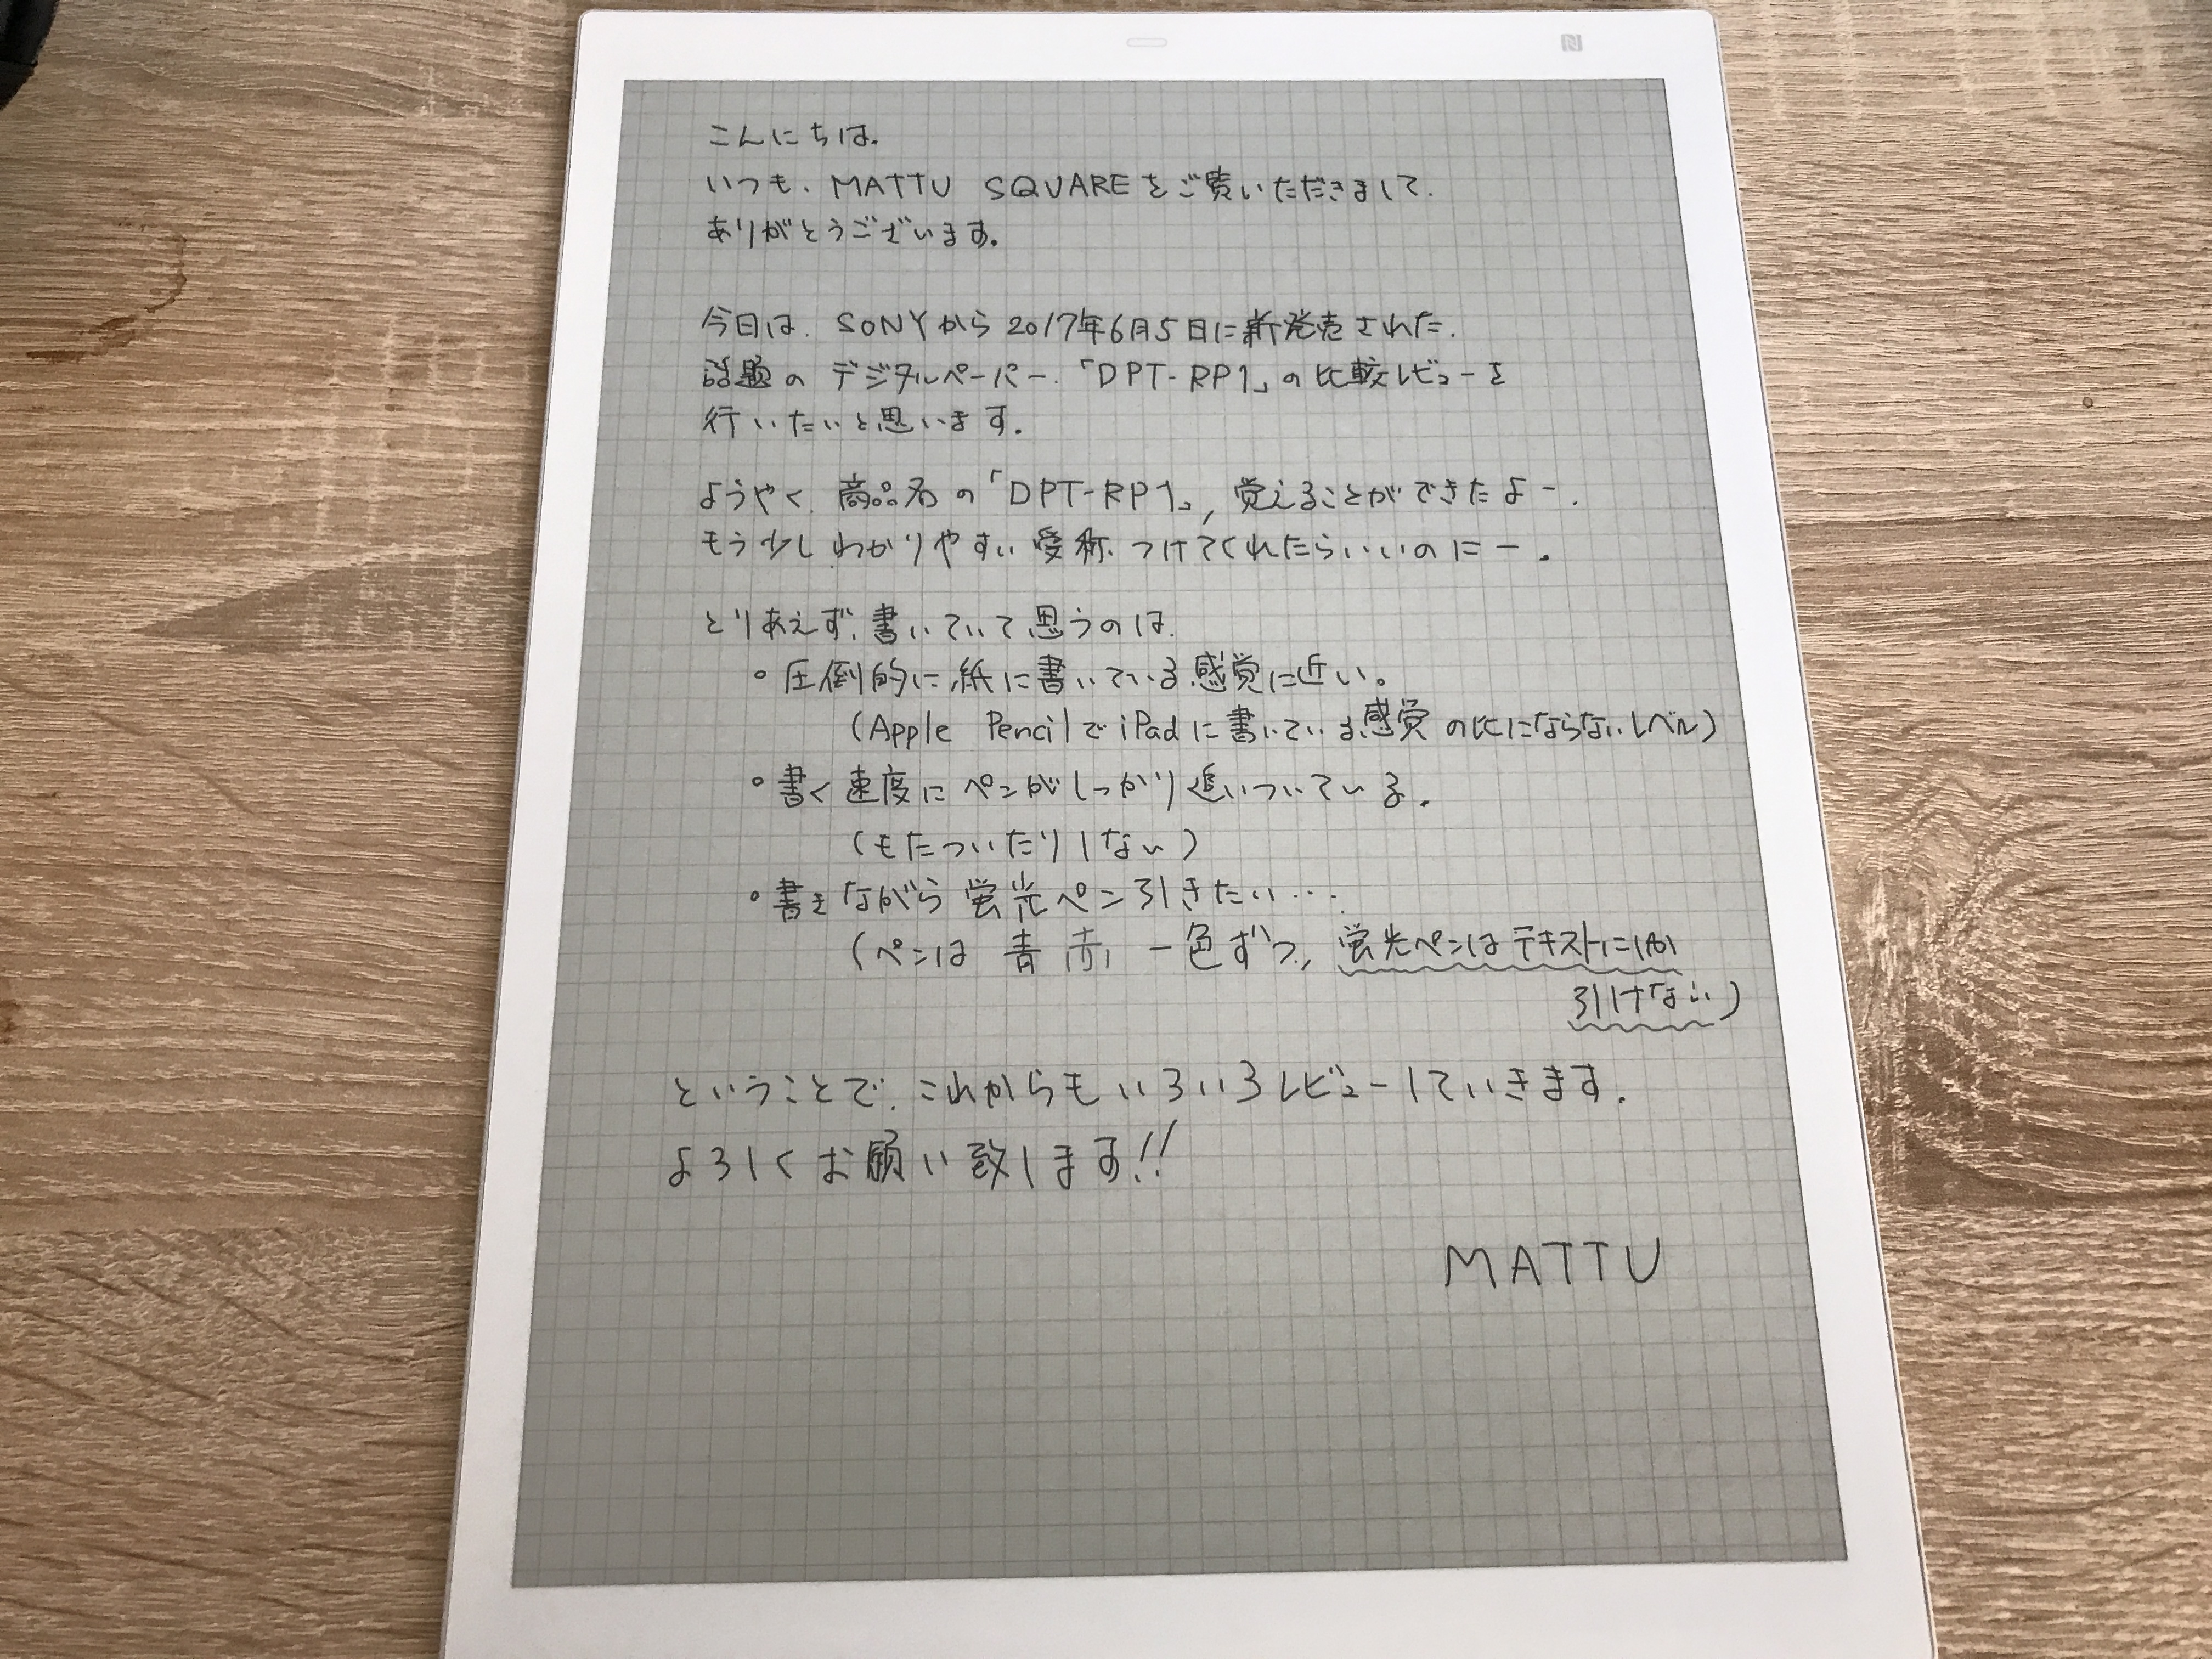 Sonyの新型デジタルペーパーDPT-RP1を5日間使ったインプレッション!